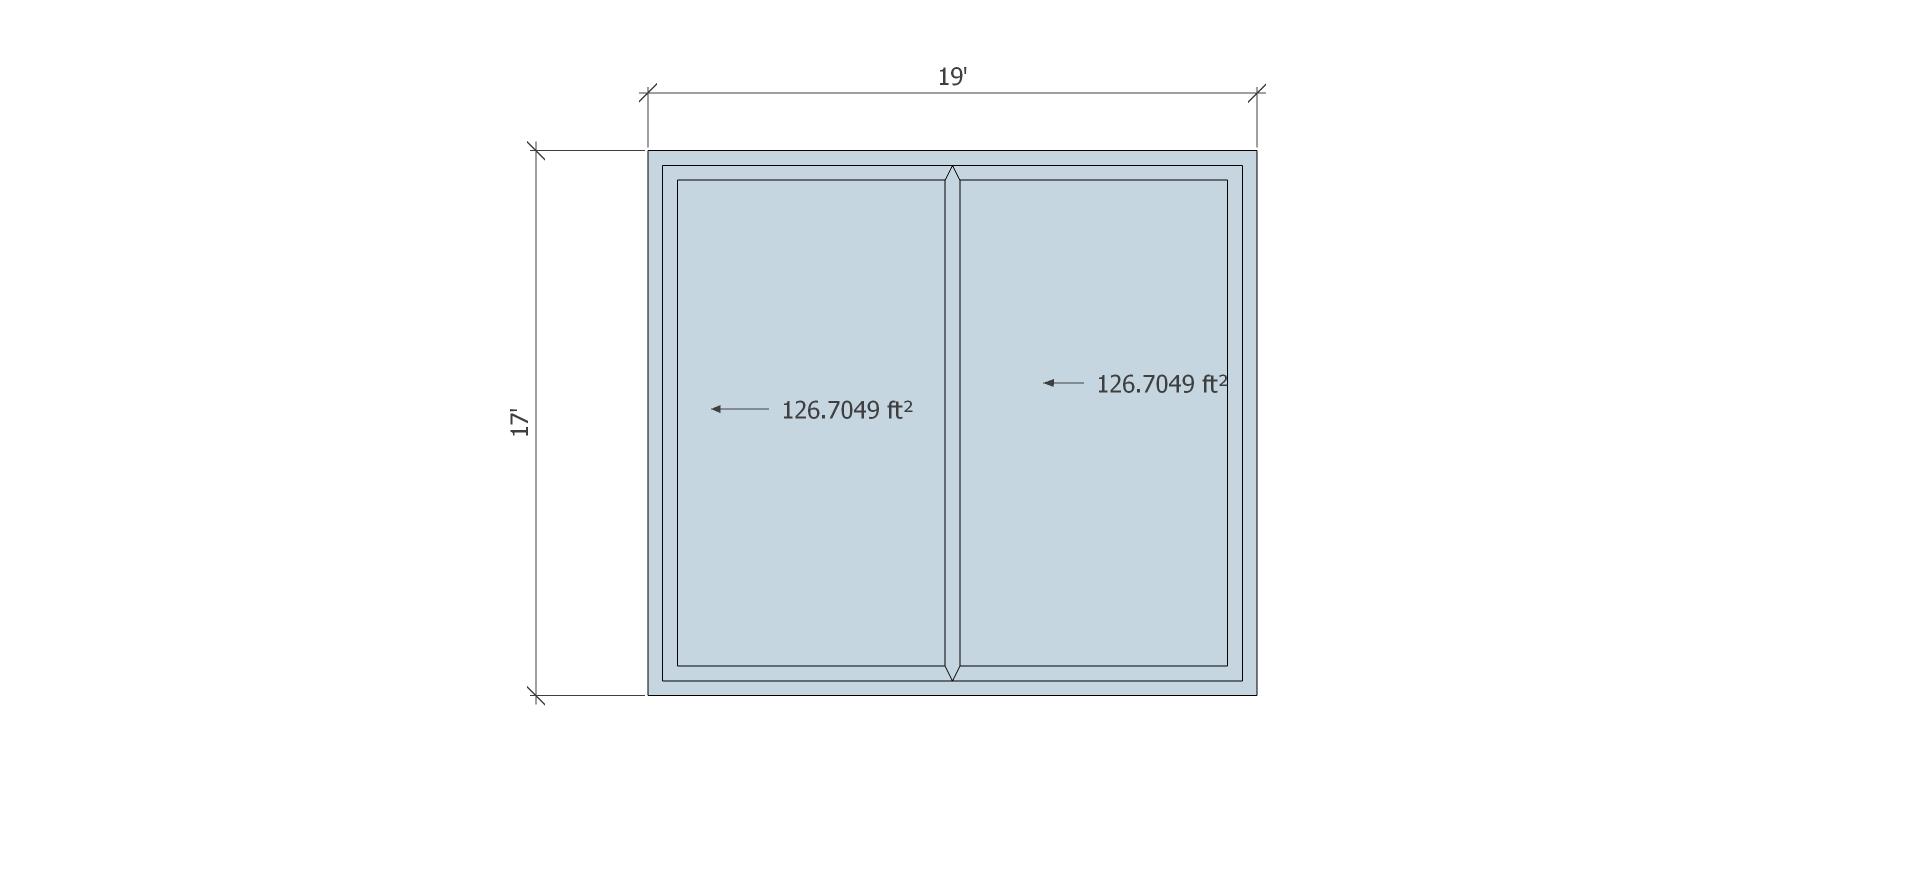 Angle decking lf-ctalk.jpg